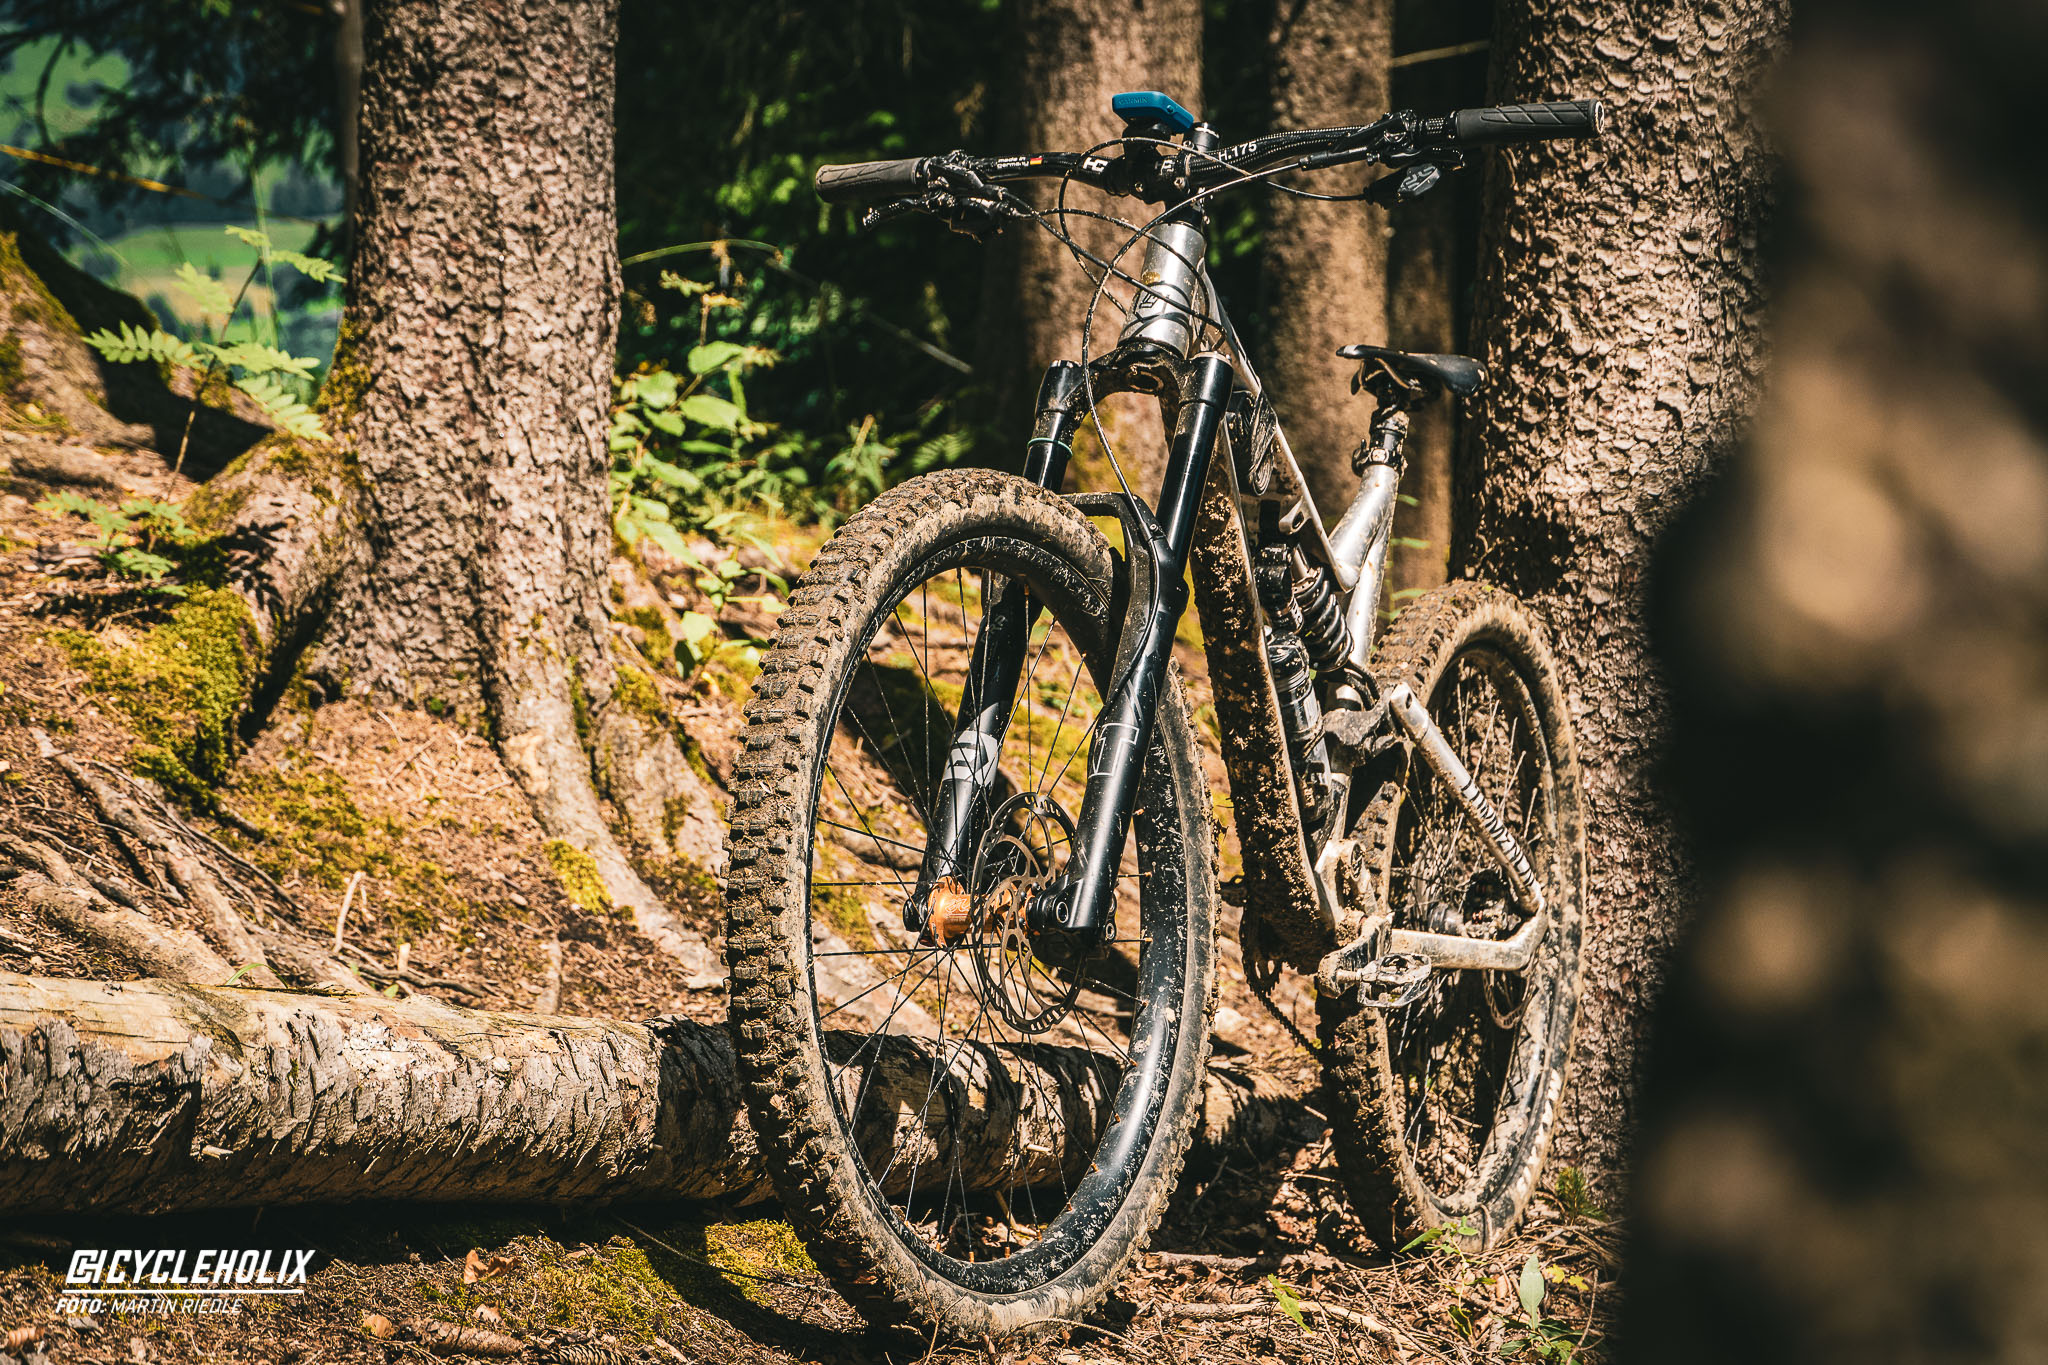 2021 EXT Storia Era 30 Cycleholix